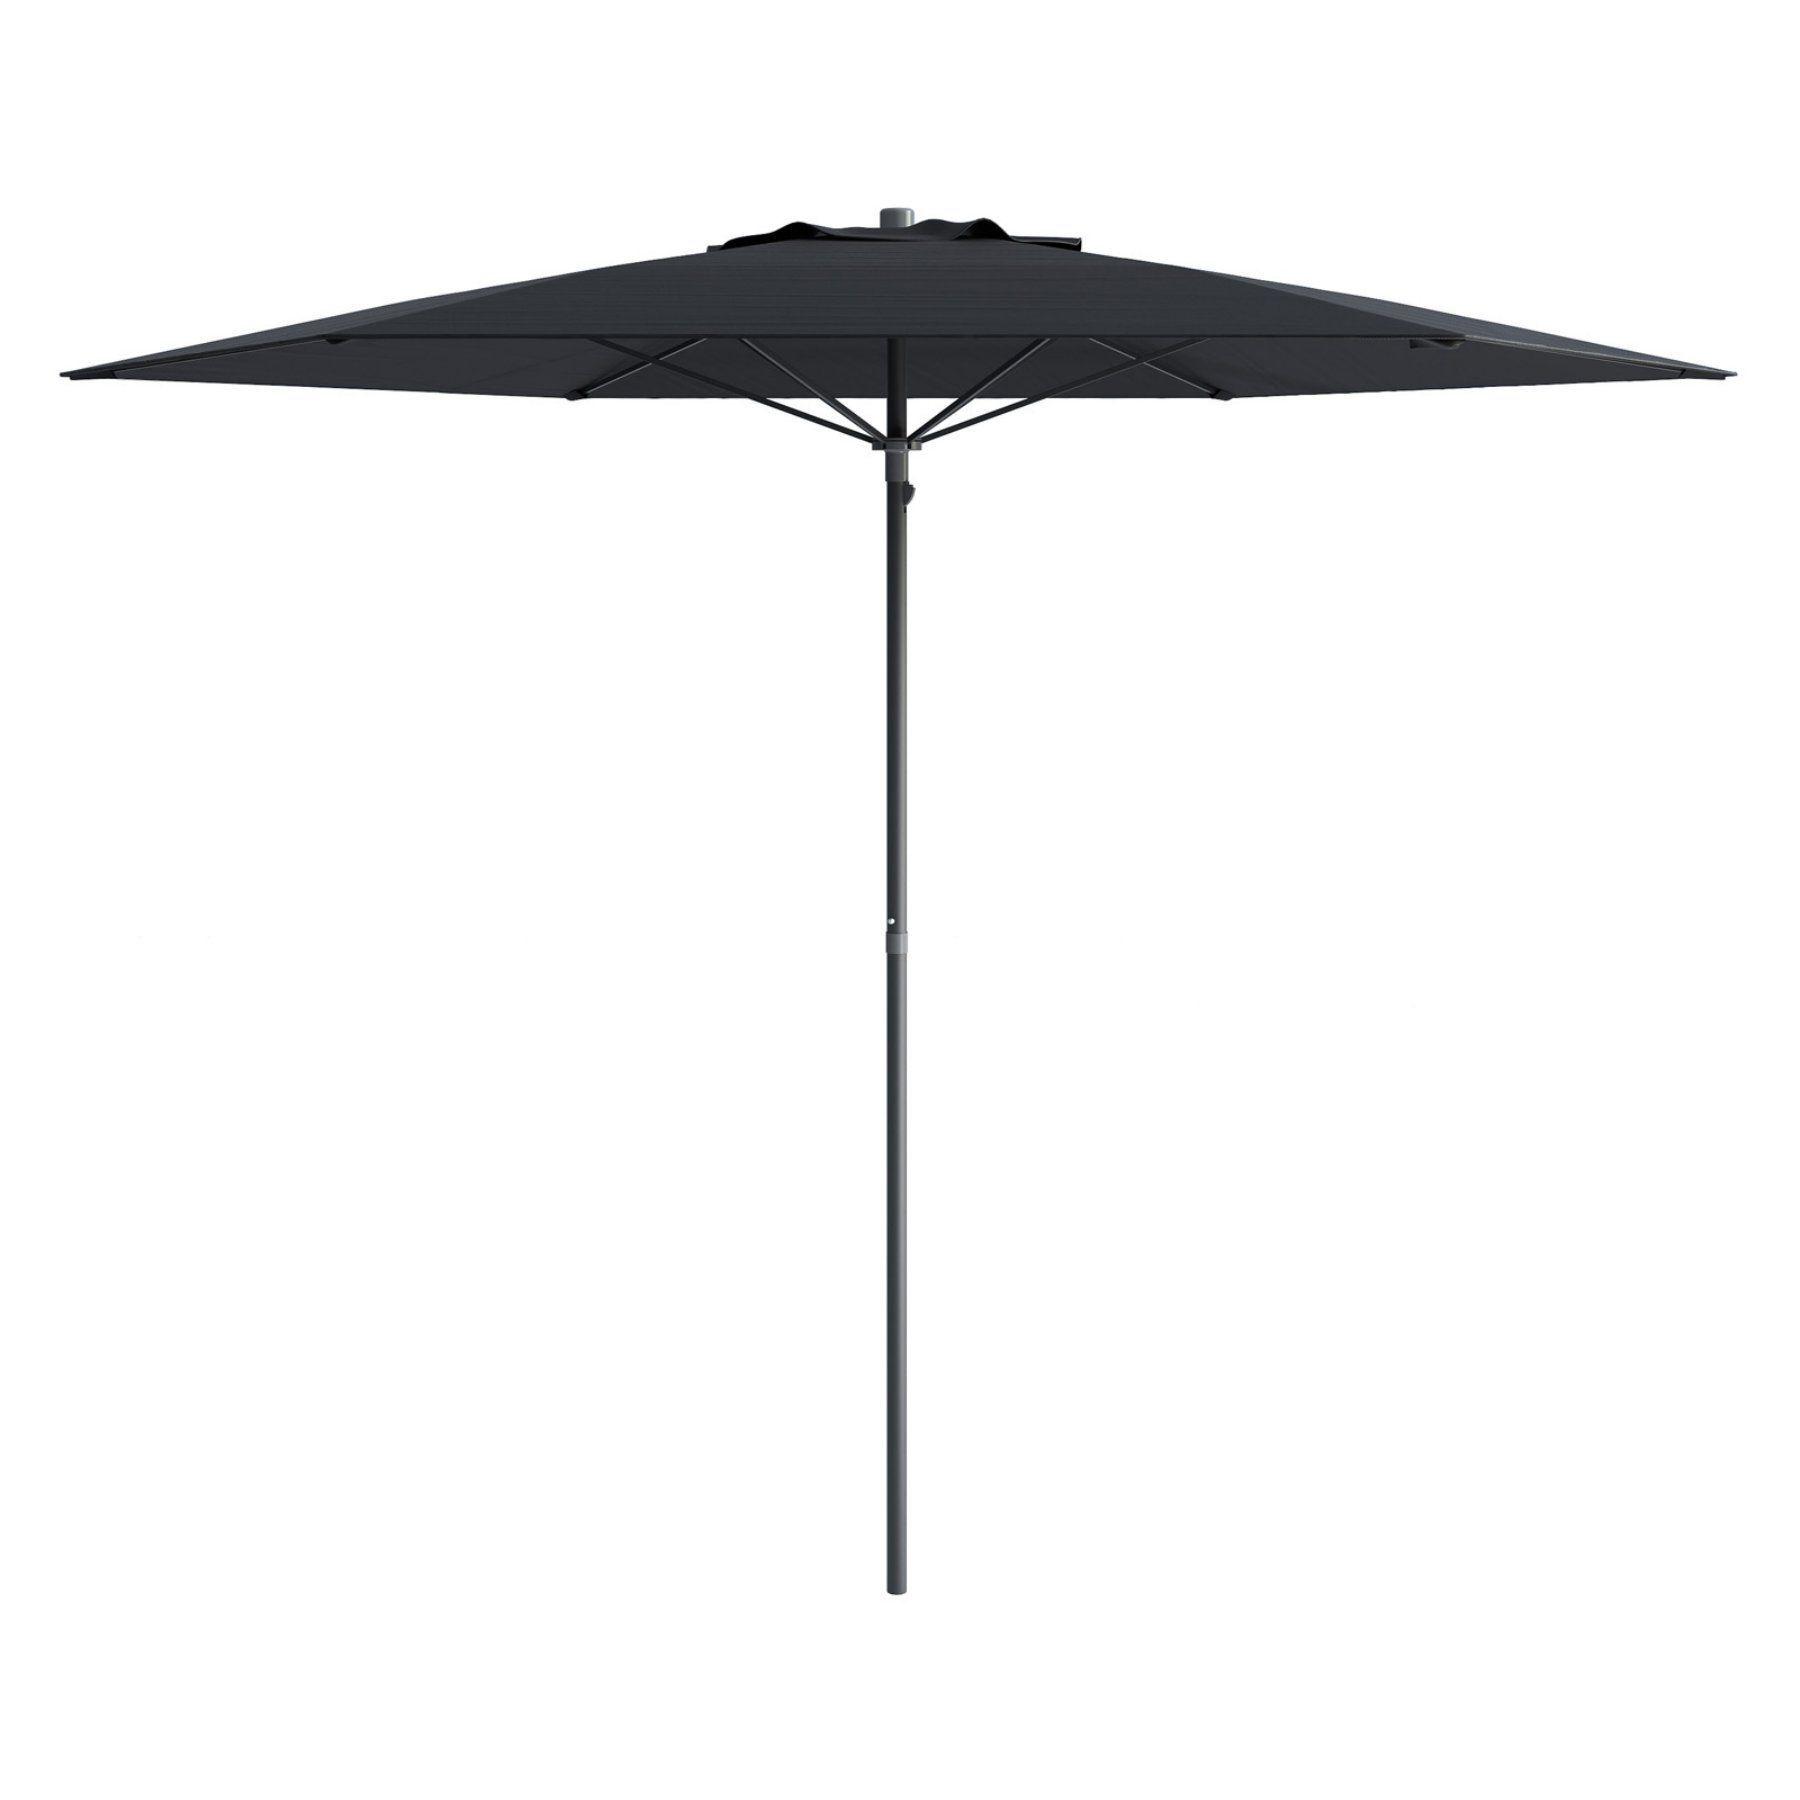 CorLiving 7 ft UV and Wind Resistant Patio Umbrella PPU 600 U